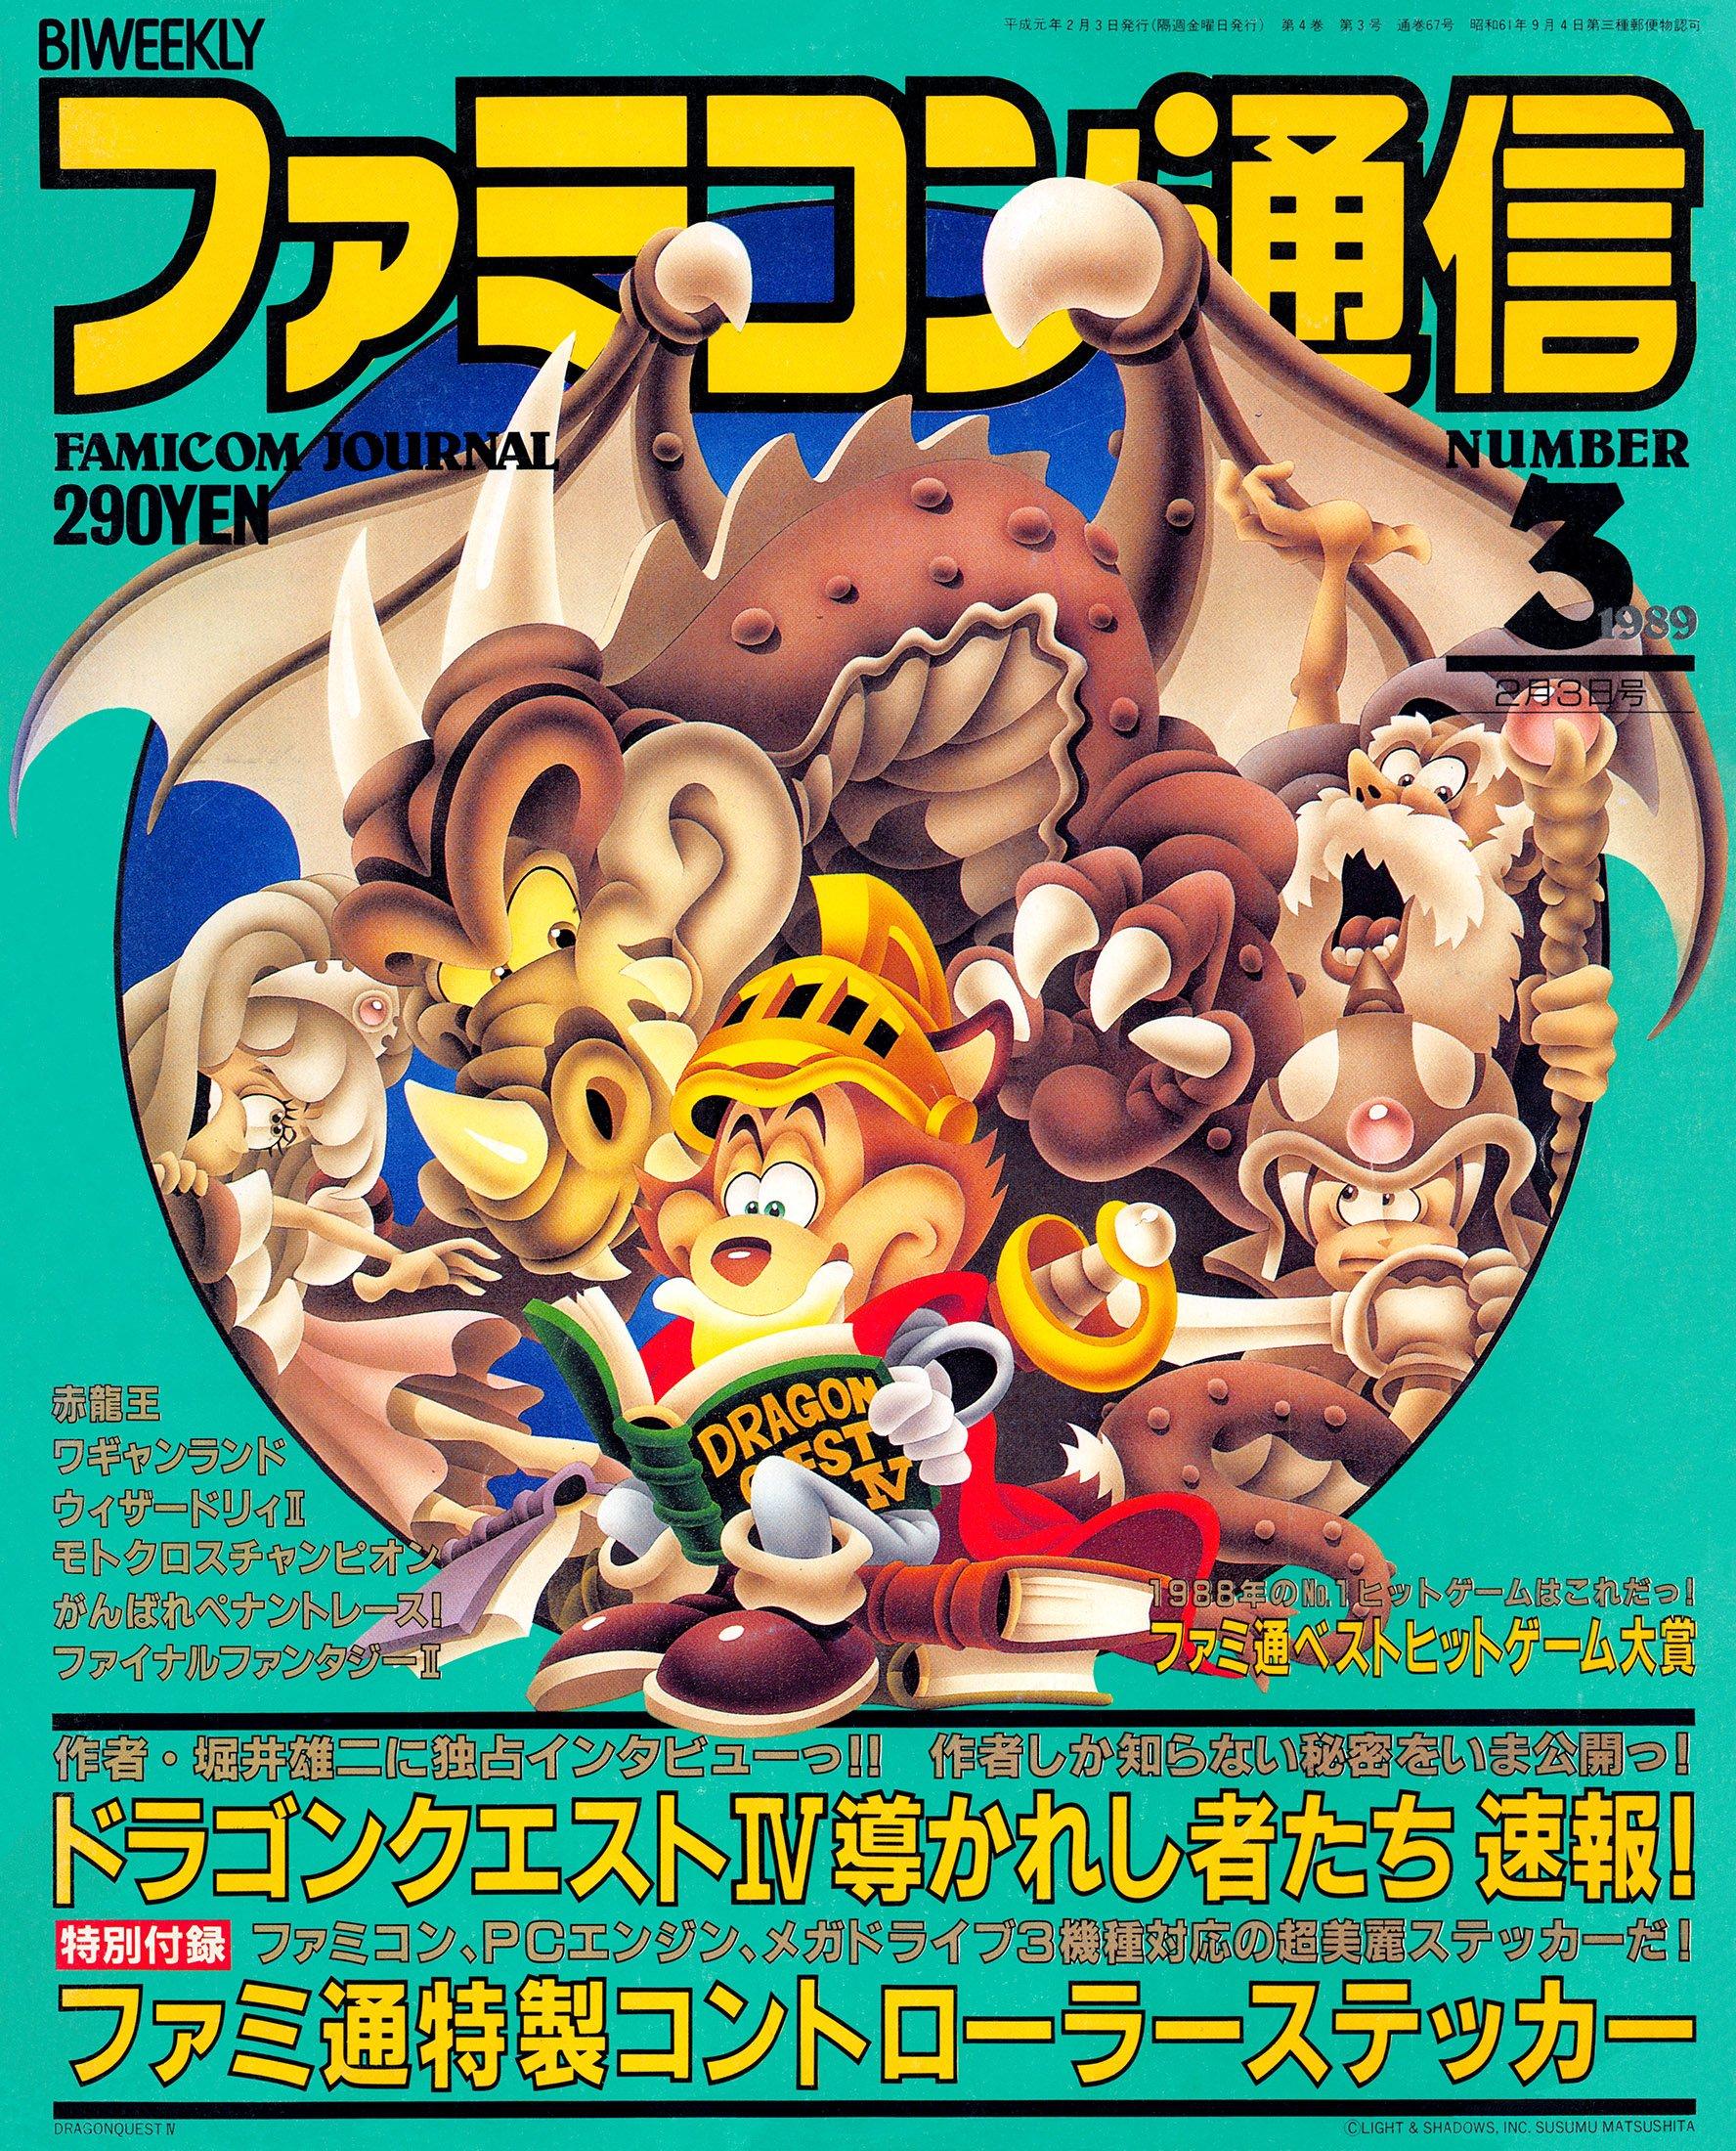 Famitsu Issue 0067 (February 3, 1989)